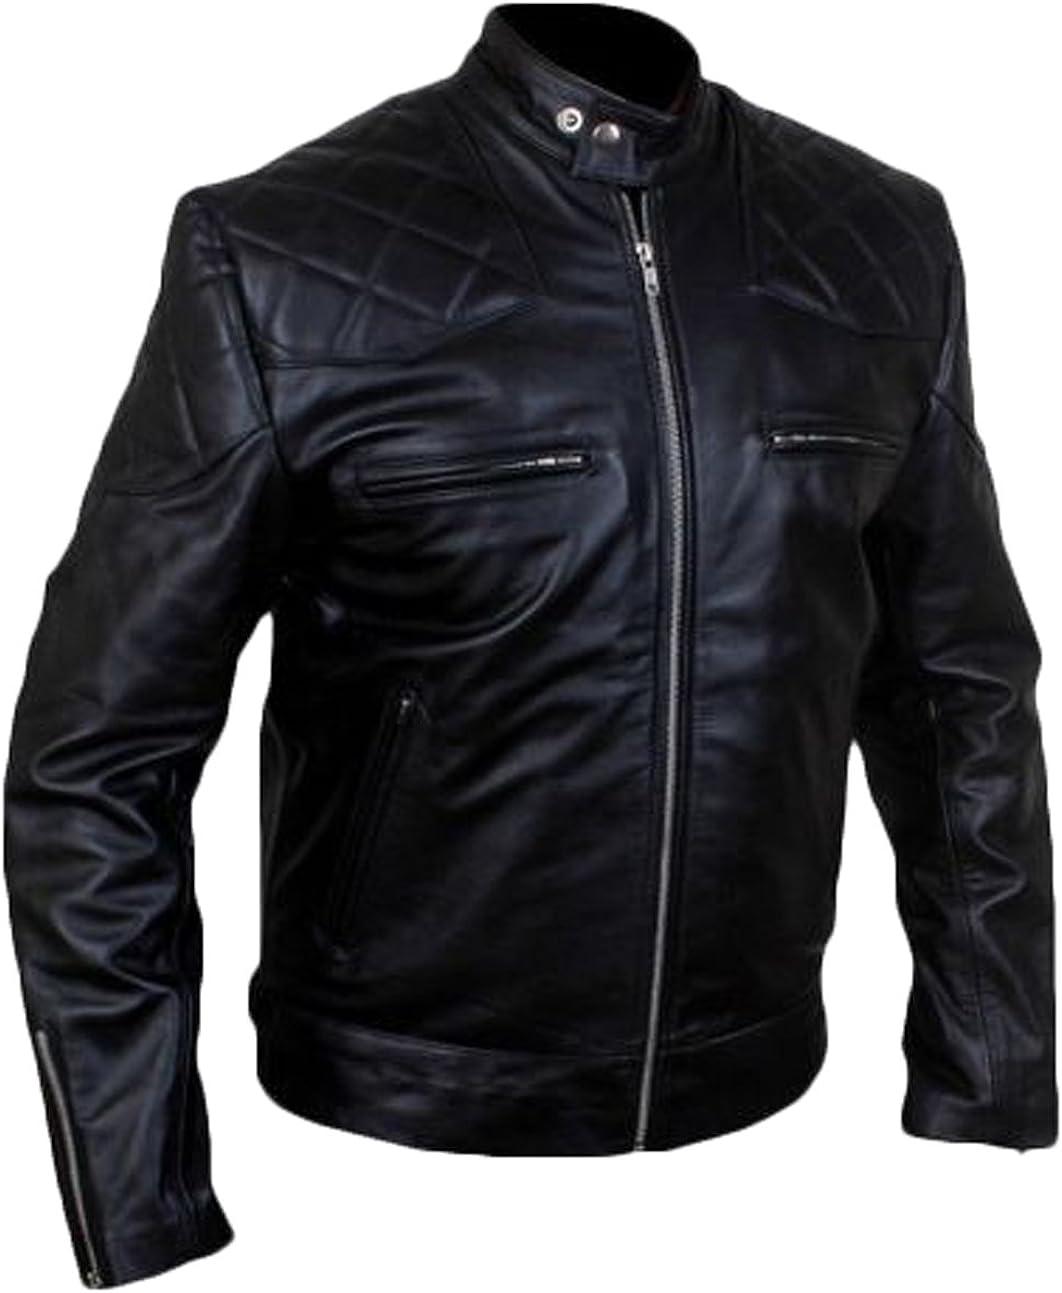 Men Leather Jacket New Soft Lambskin Slim Biker Bomber Coat T1363